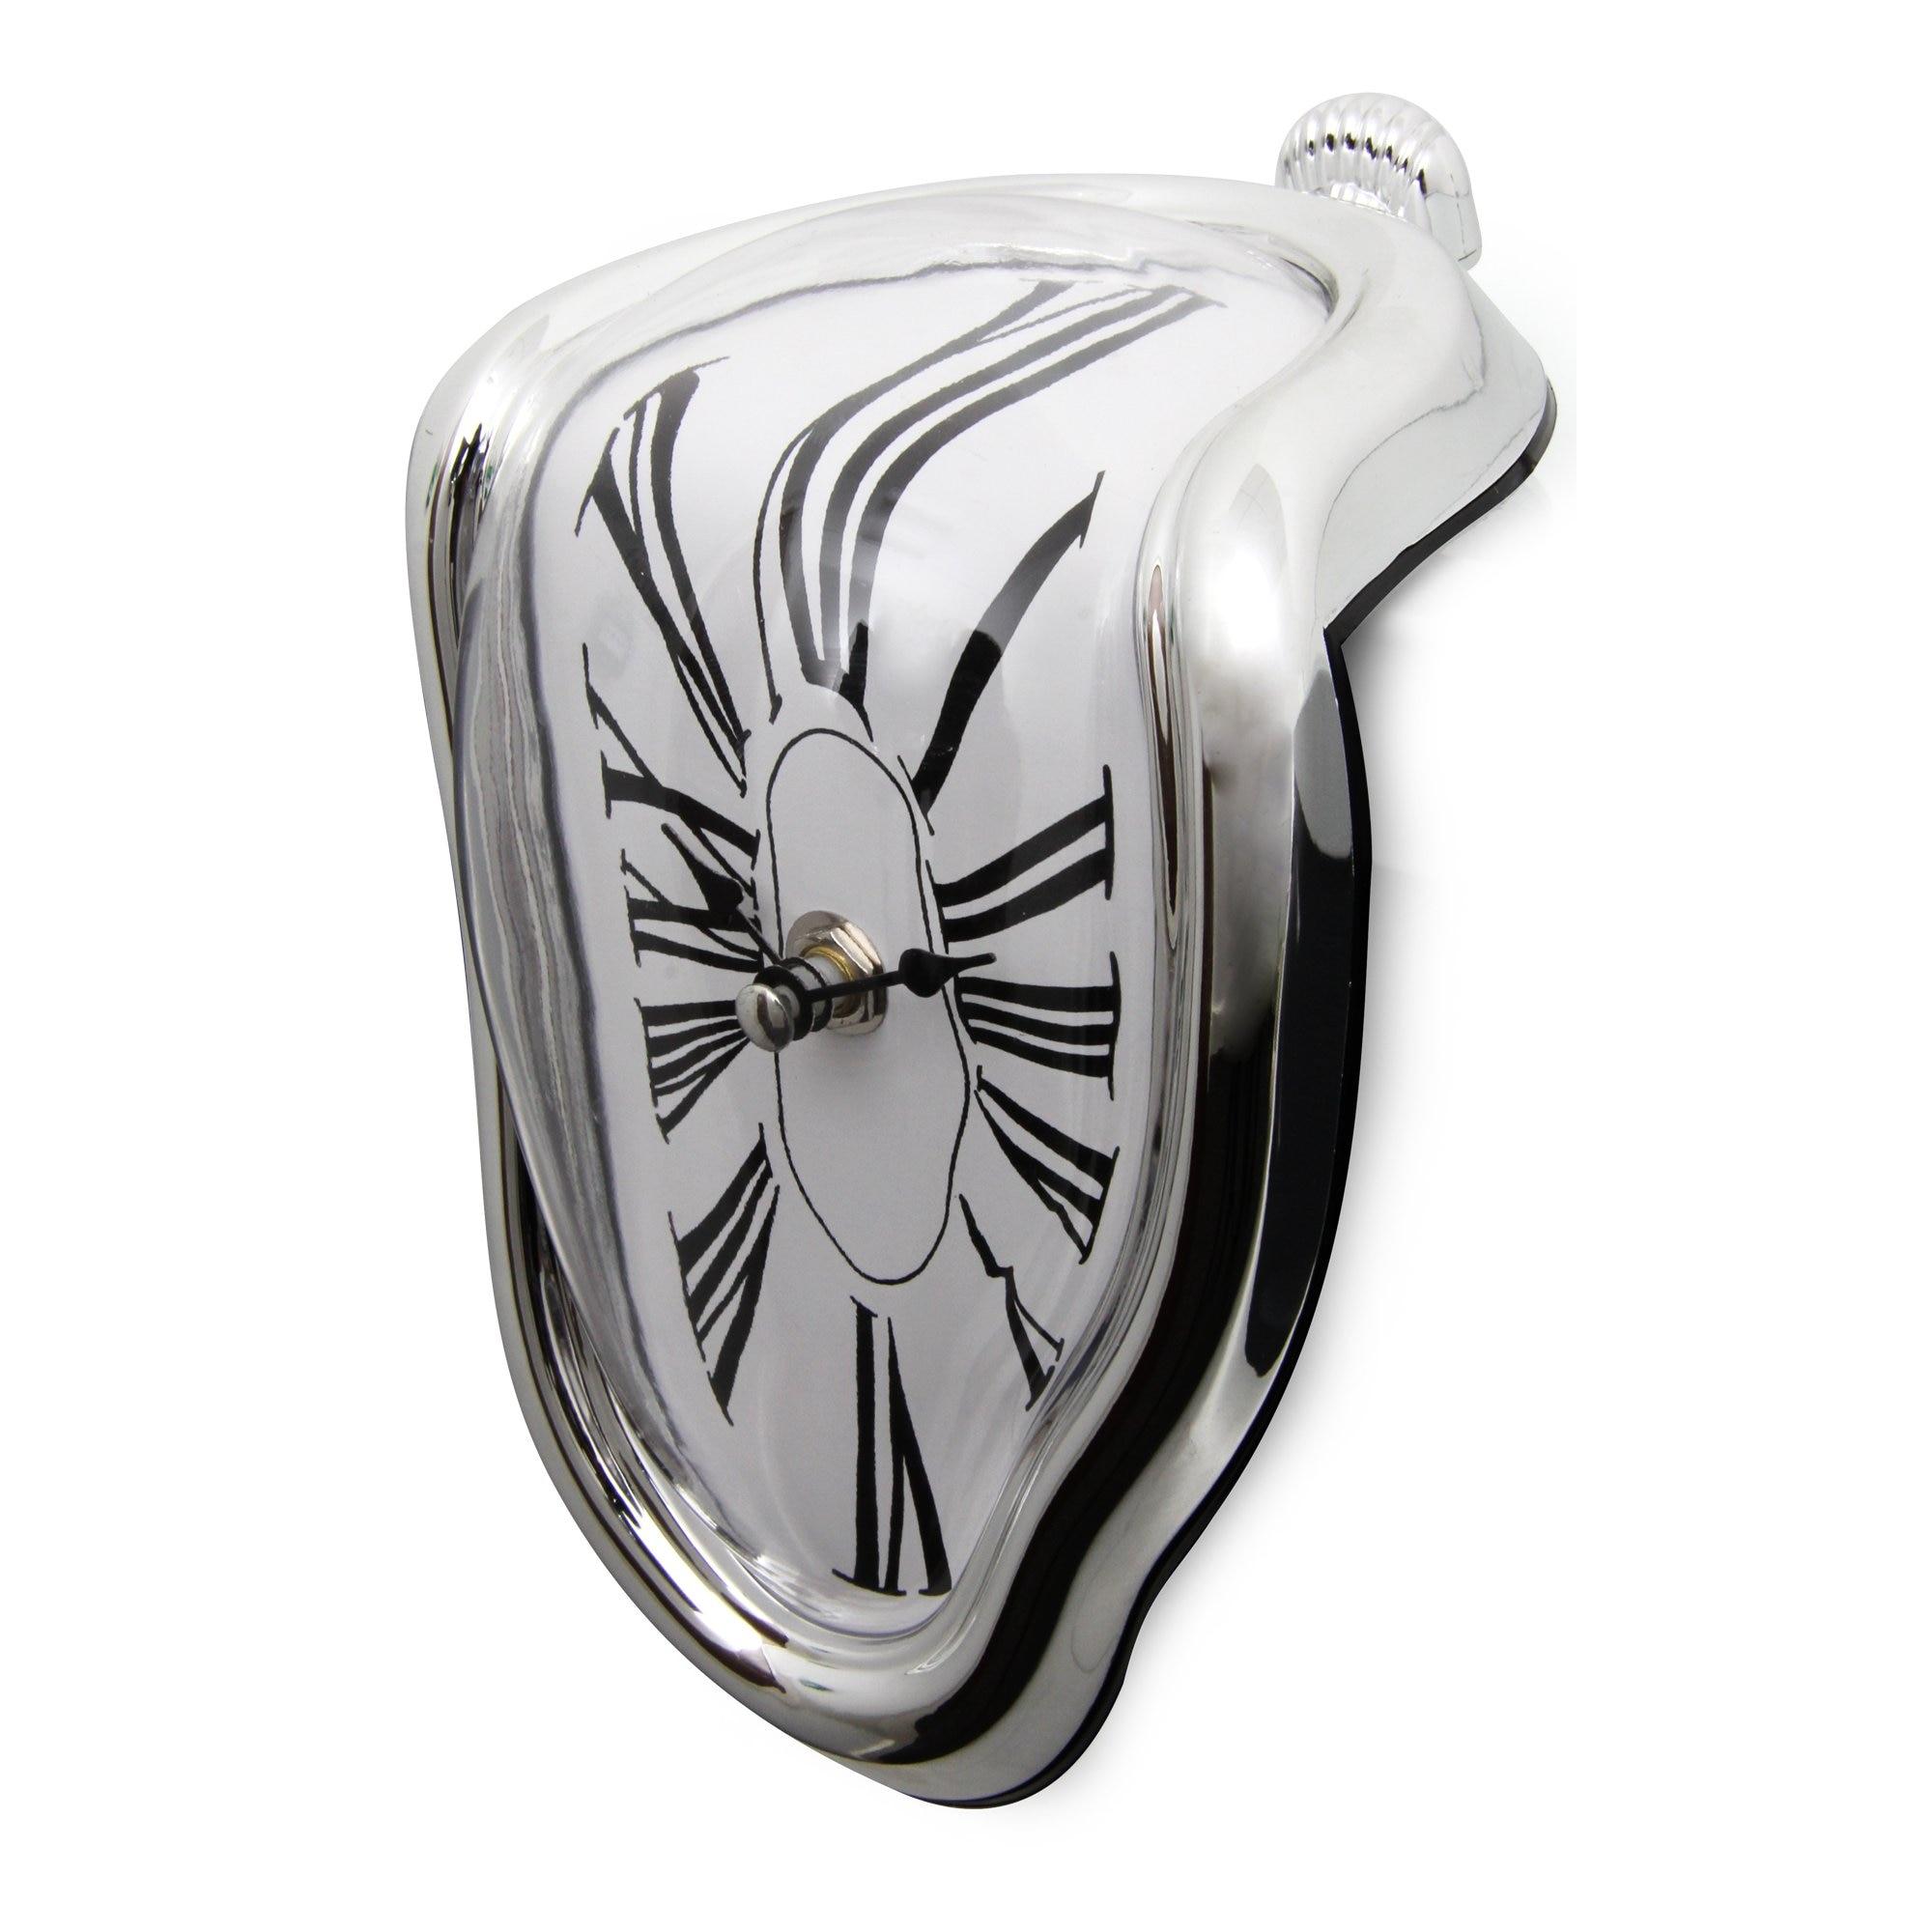 Horloge fondante 2